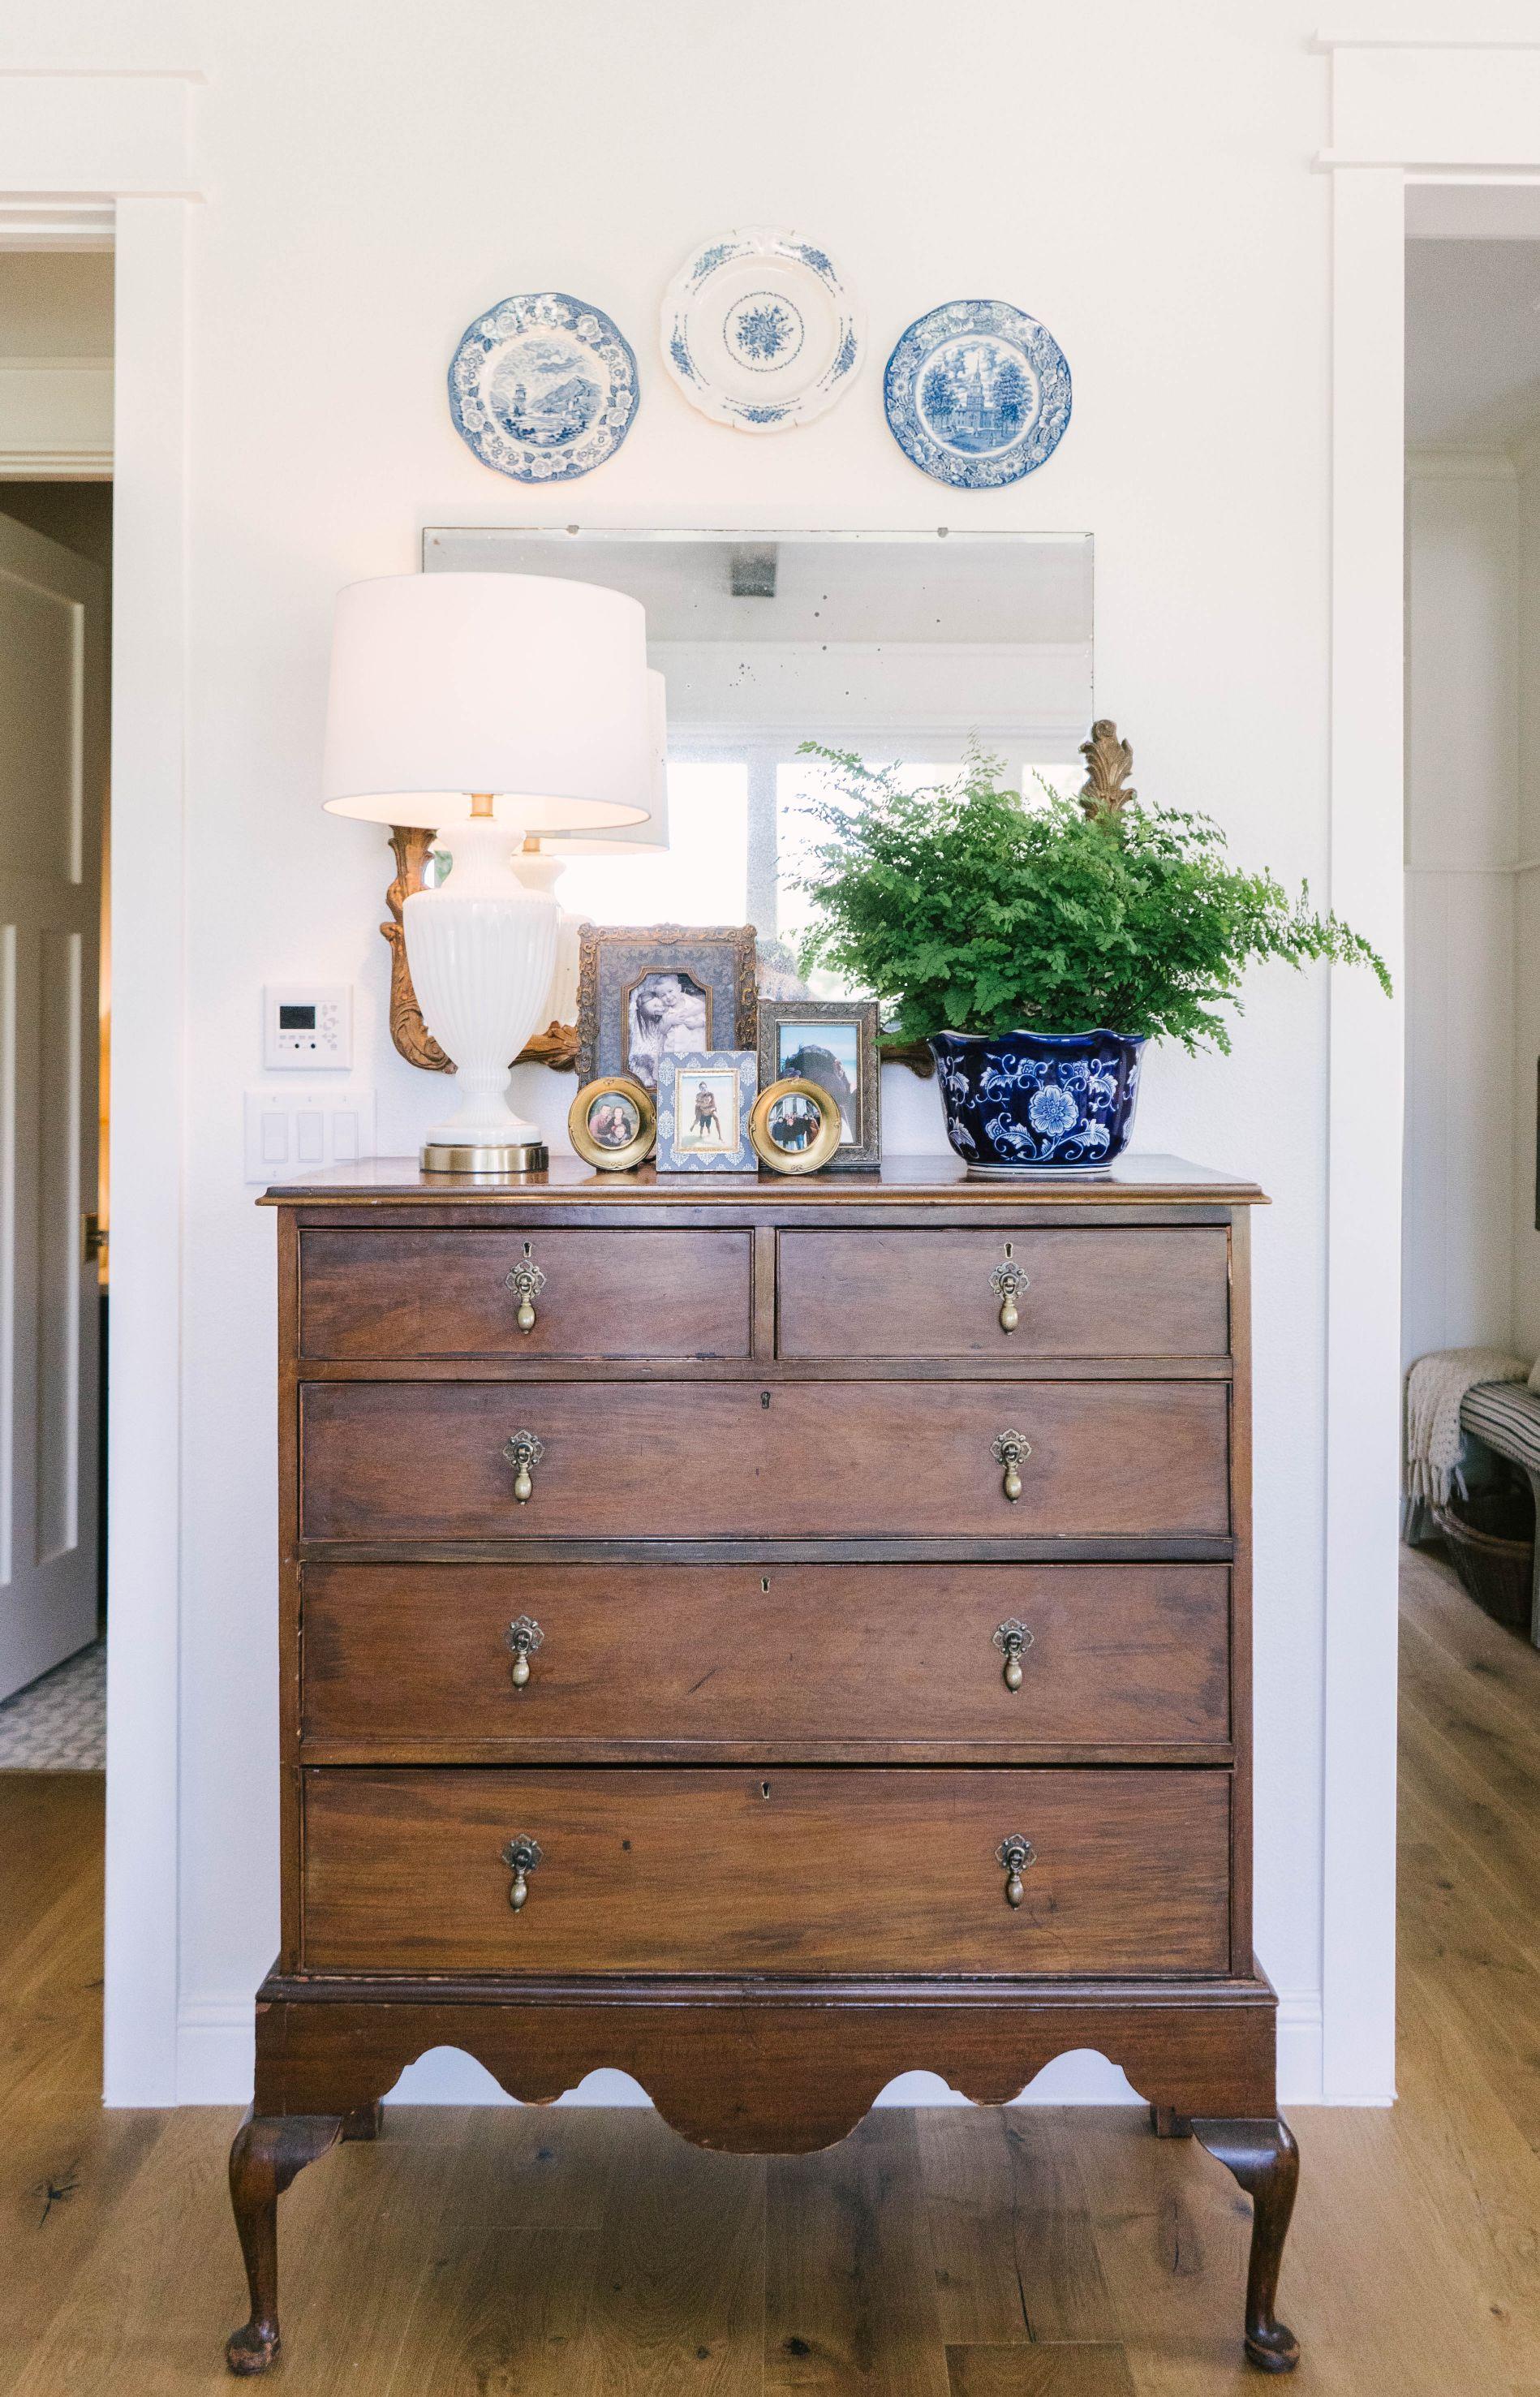 Classic Farmhouse Home Tour - Master Bedroom - Vintage Dresser